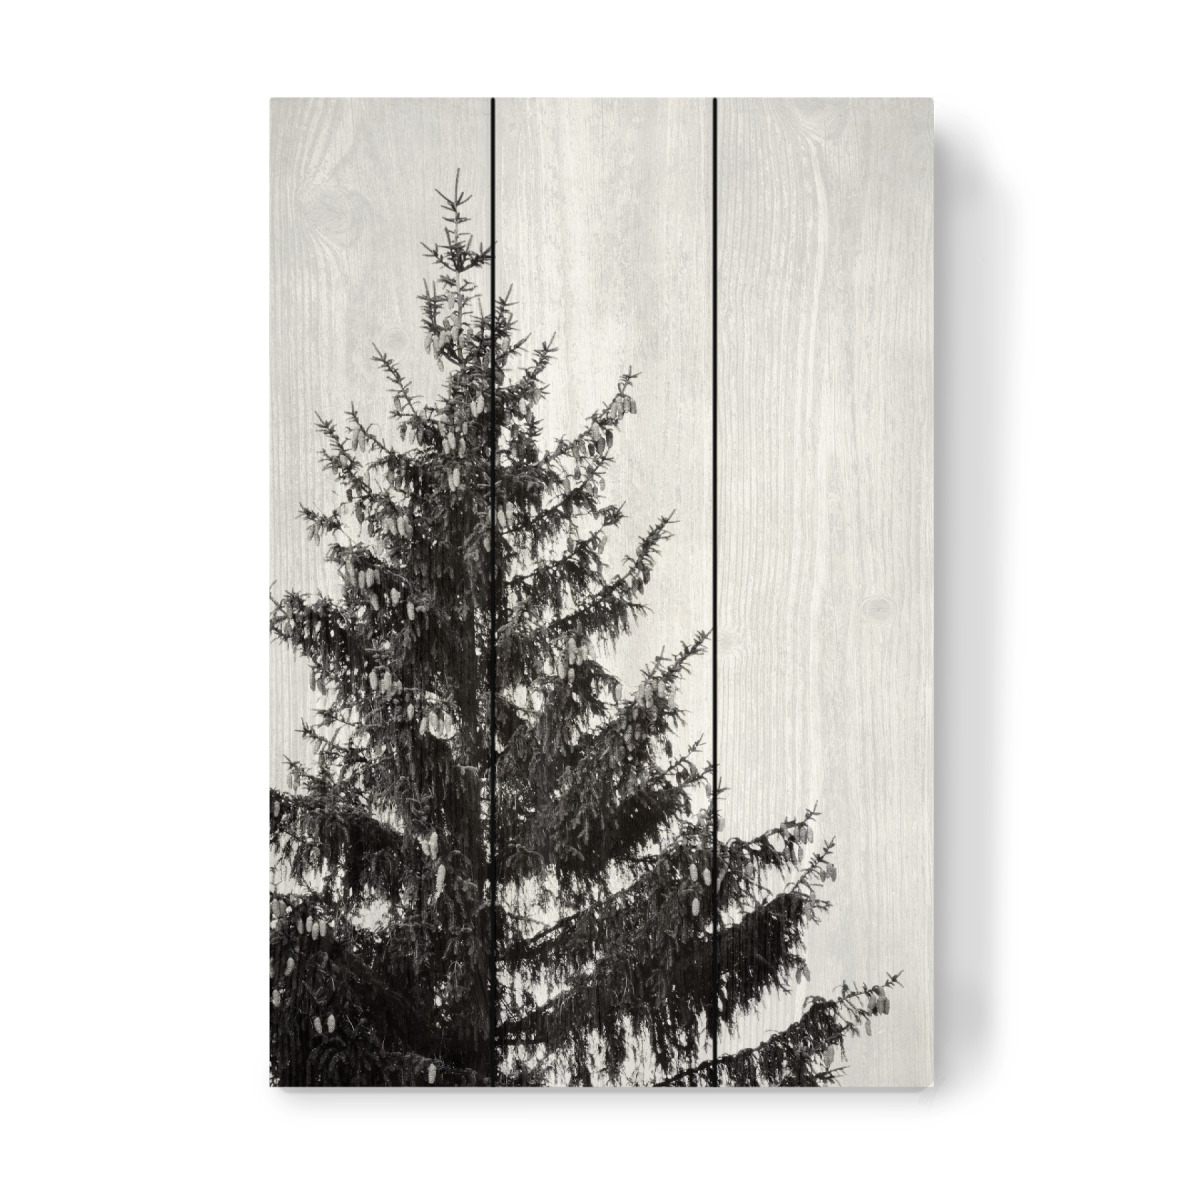 Black And White Pine Tree Left Als Holzbild Bei Artboxone Kaufen